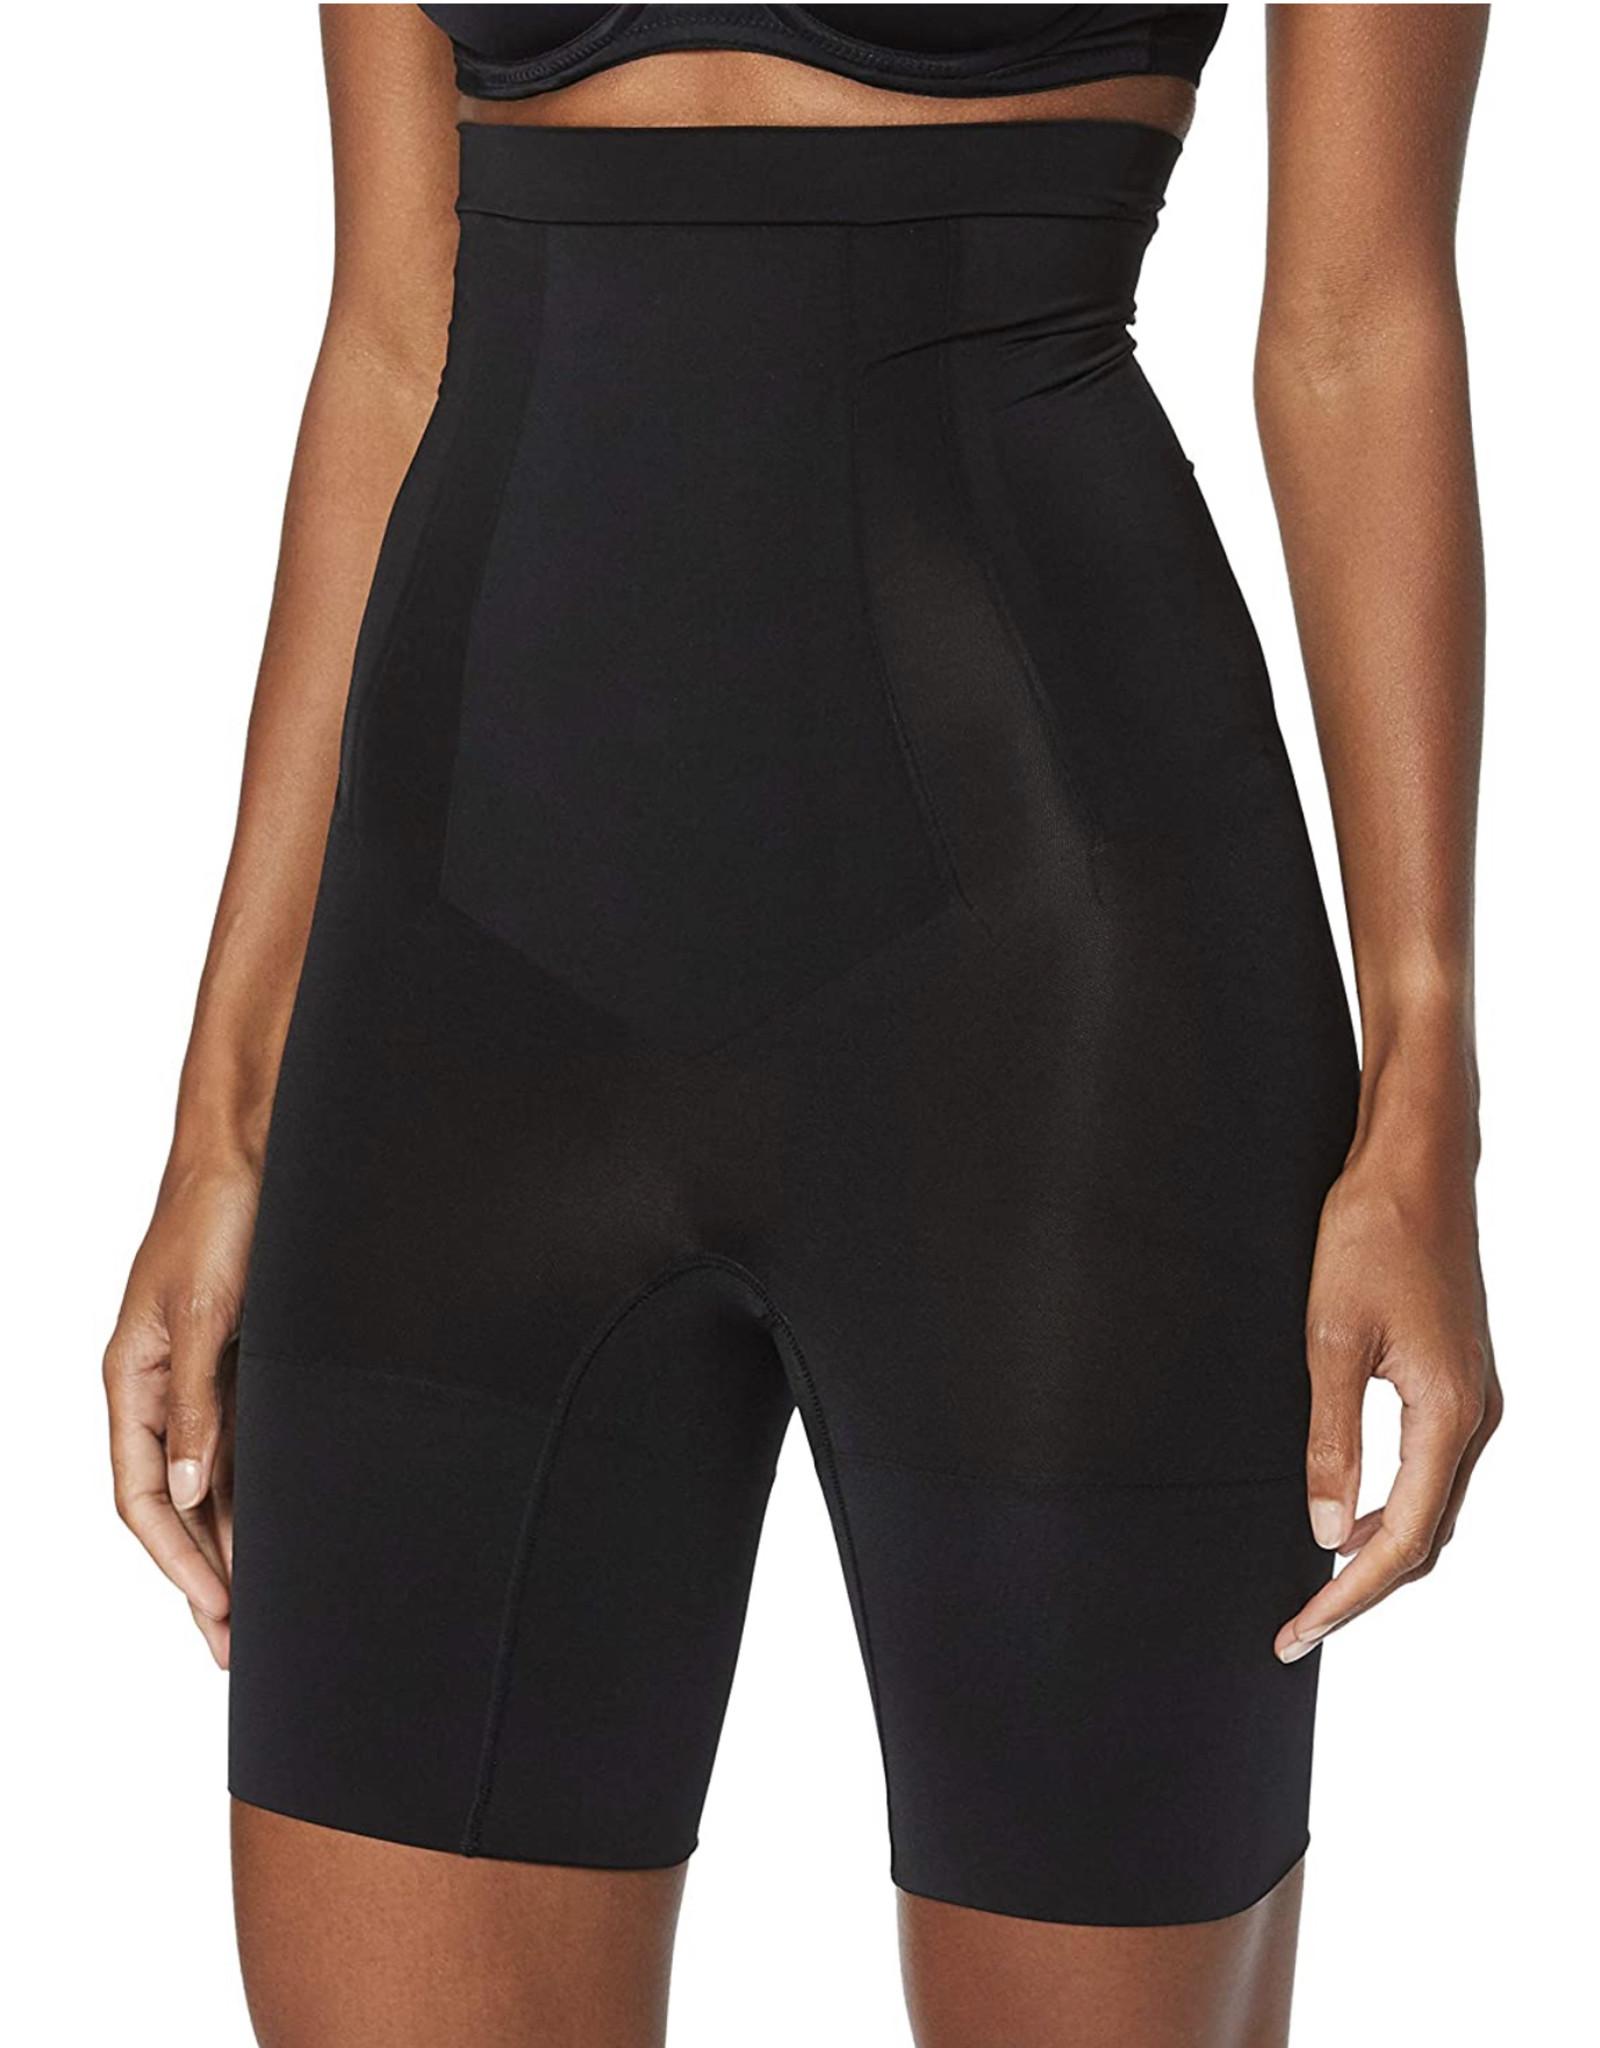 Spanx Spanx Women's Oncore High-Waist Mid Thigh Shorts SS1915